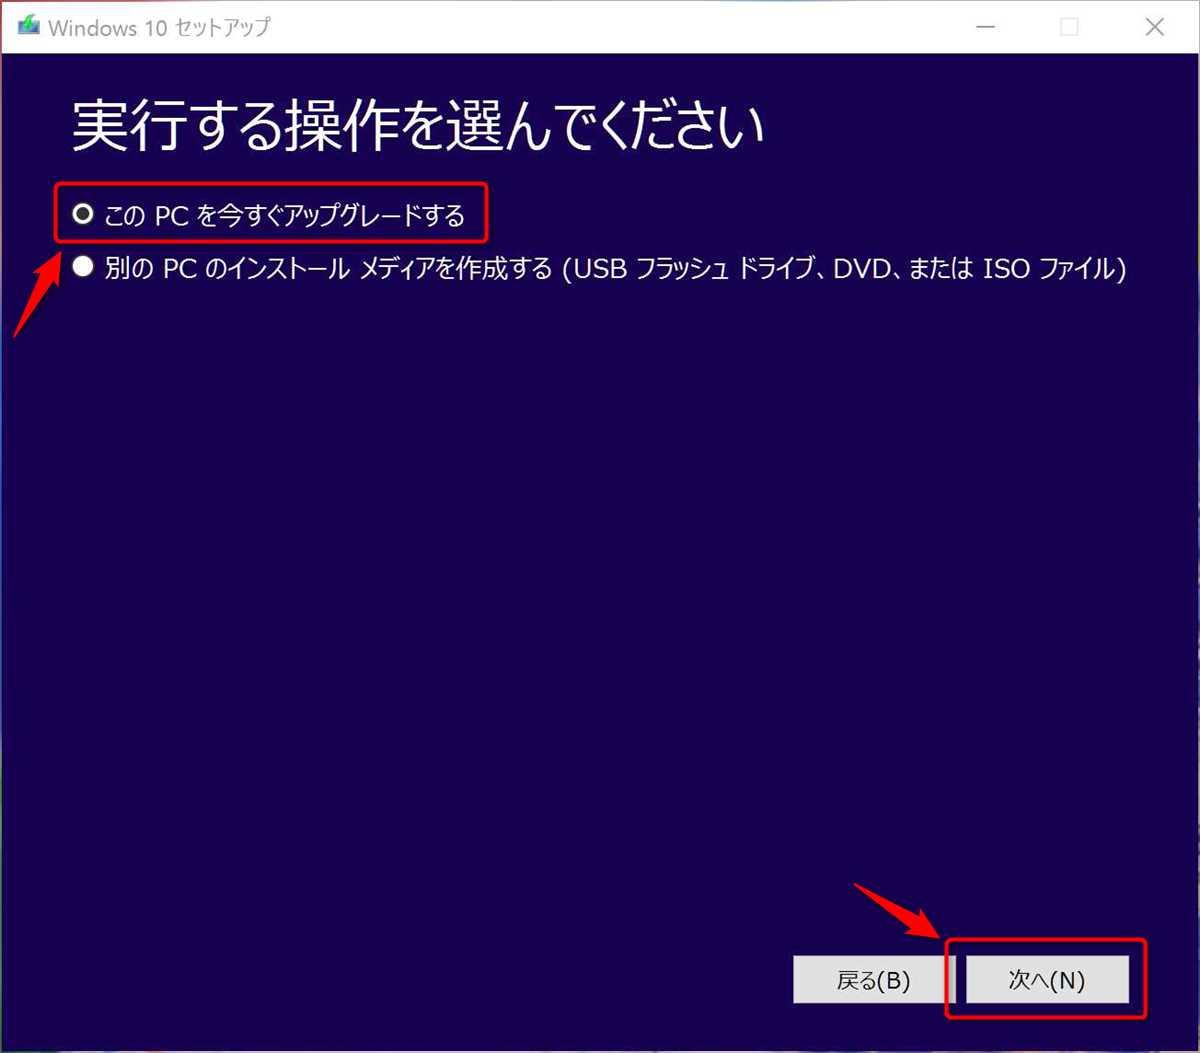 Apply Windows 10 Creators Update manually - 1